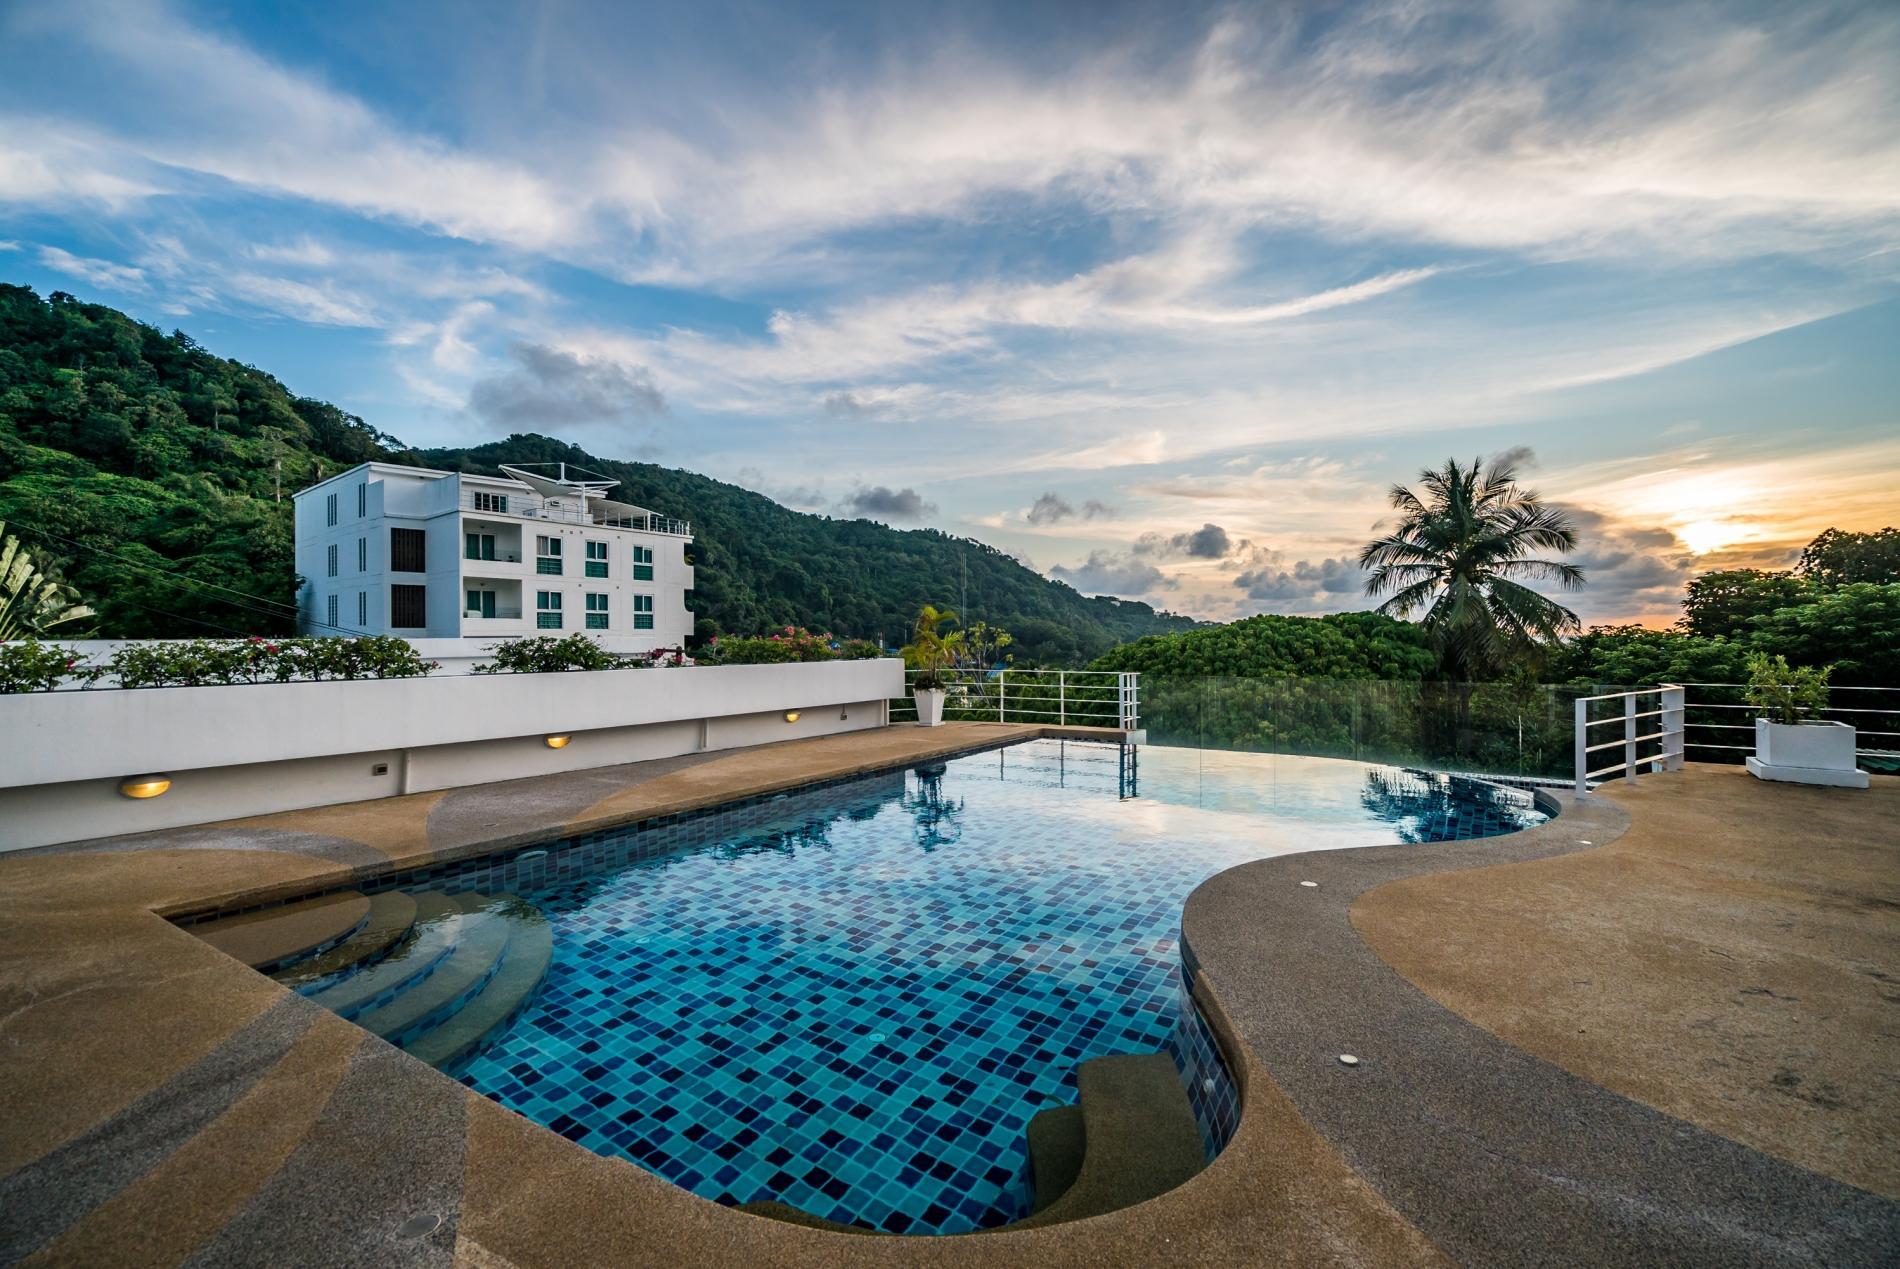 Apartment Kata Ocean View condominium - 1 bdr mountain view apartment photo 20321135